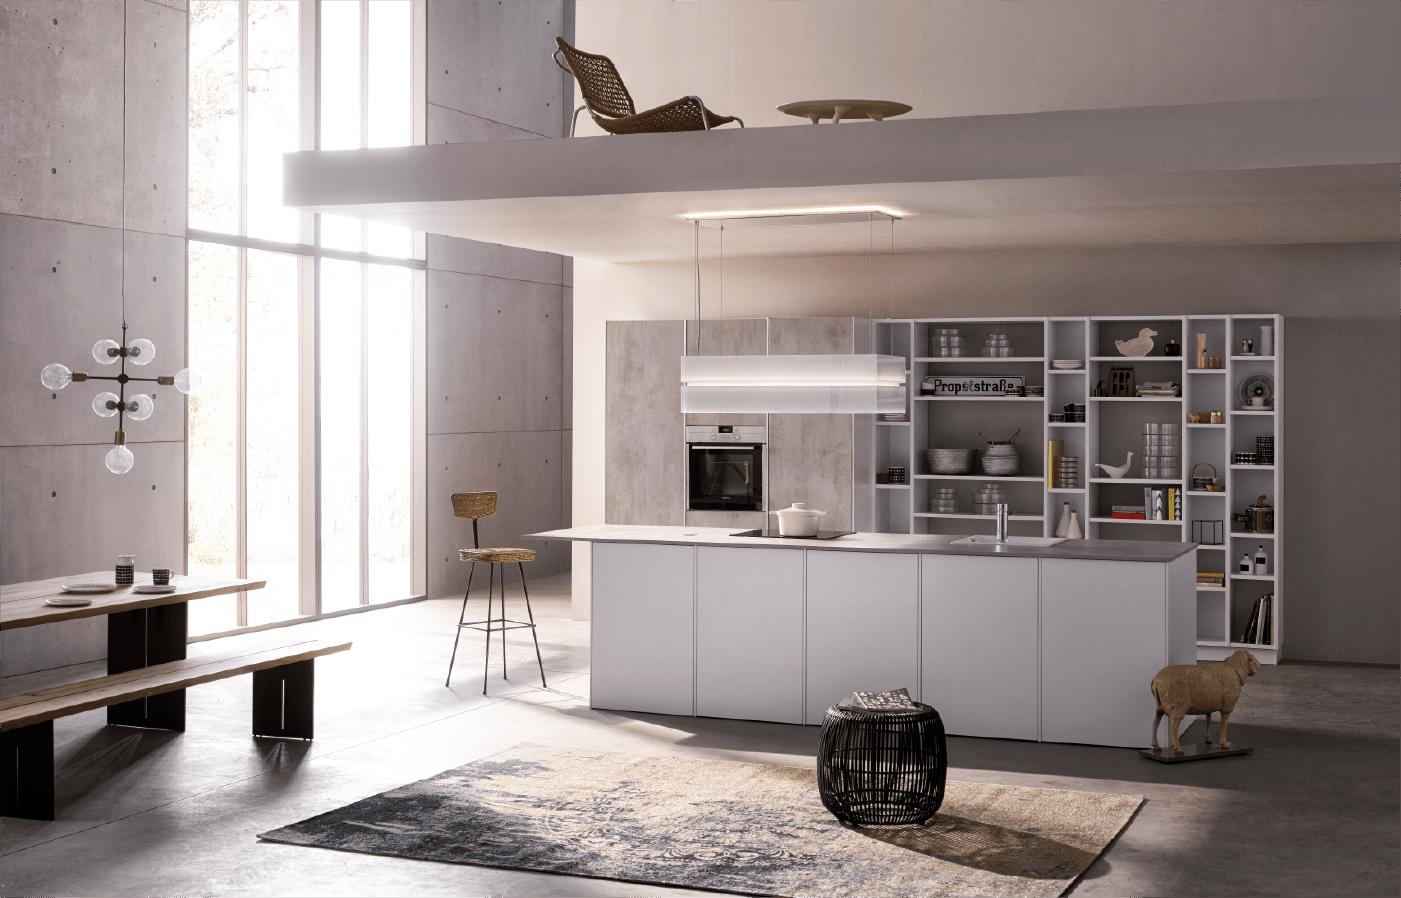 Cabeo-keukens-1-keuken-foto-6